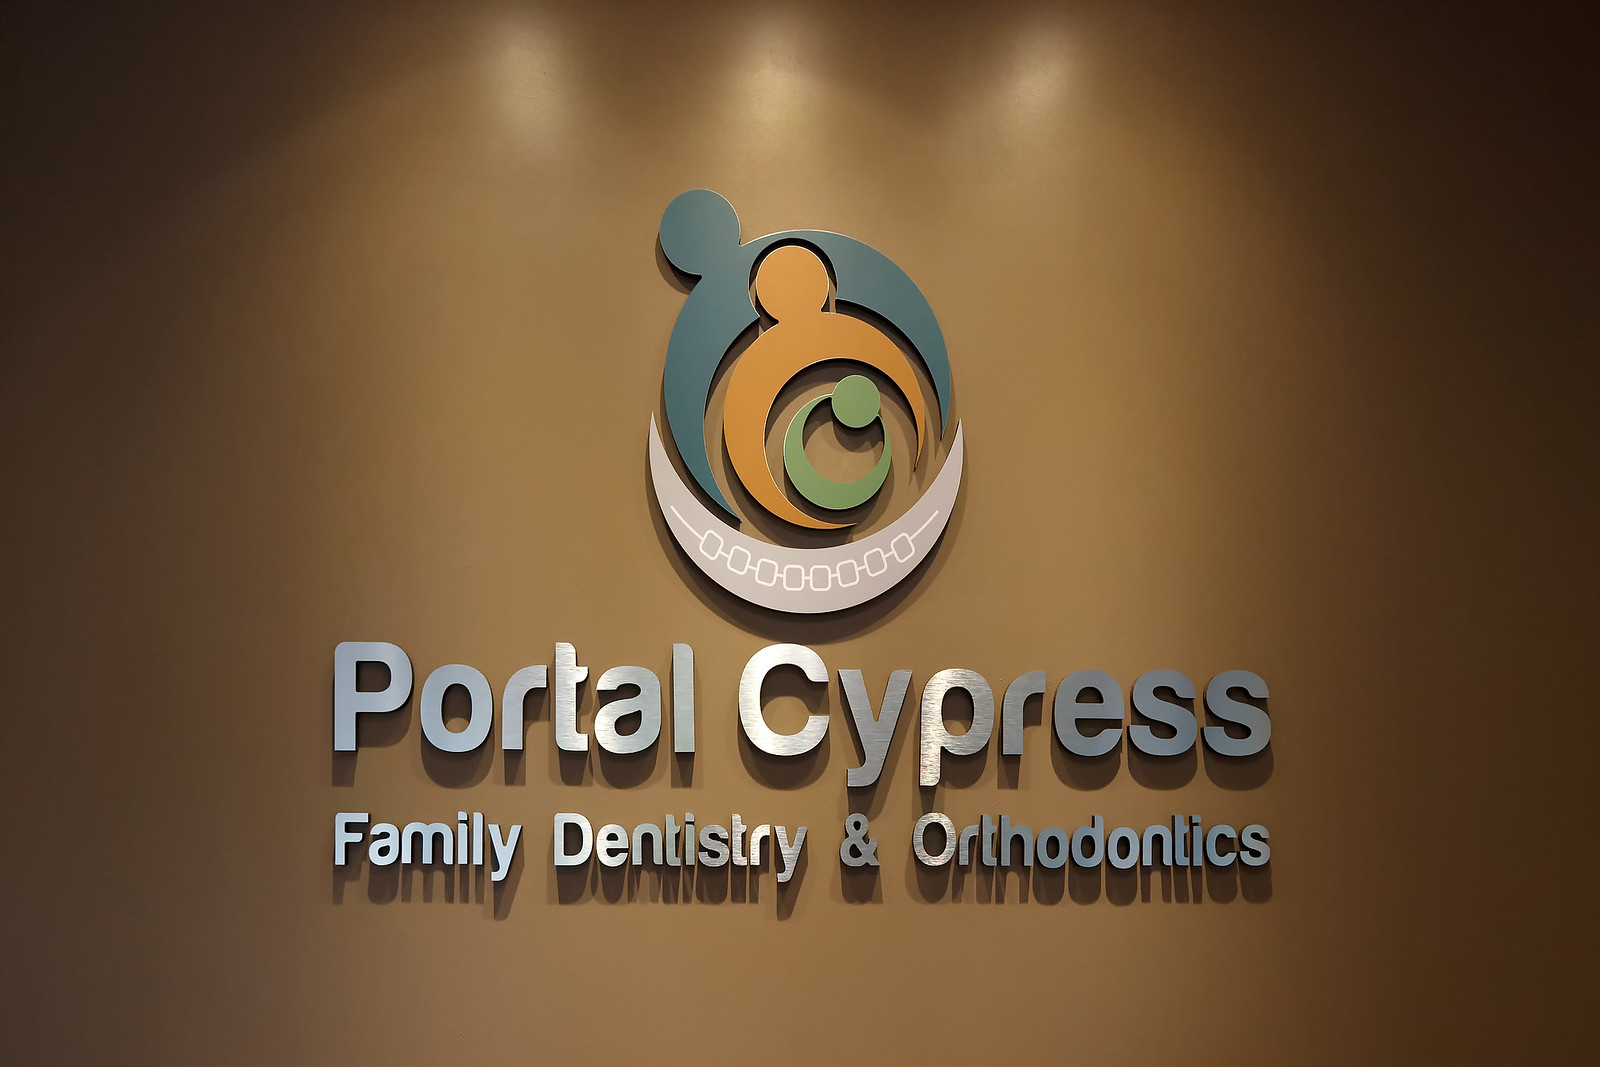 Portal-Cypress-Dentistry-logo